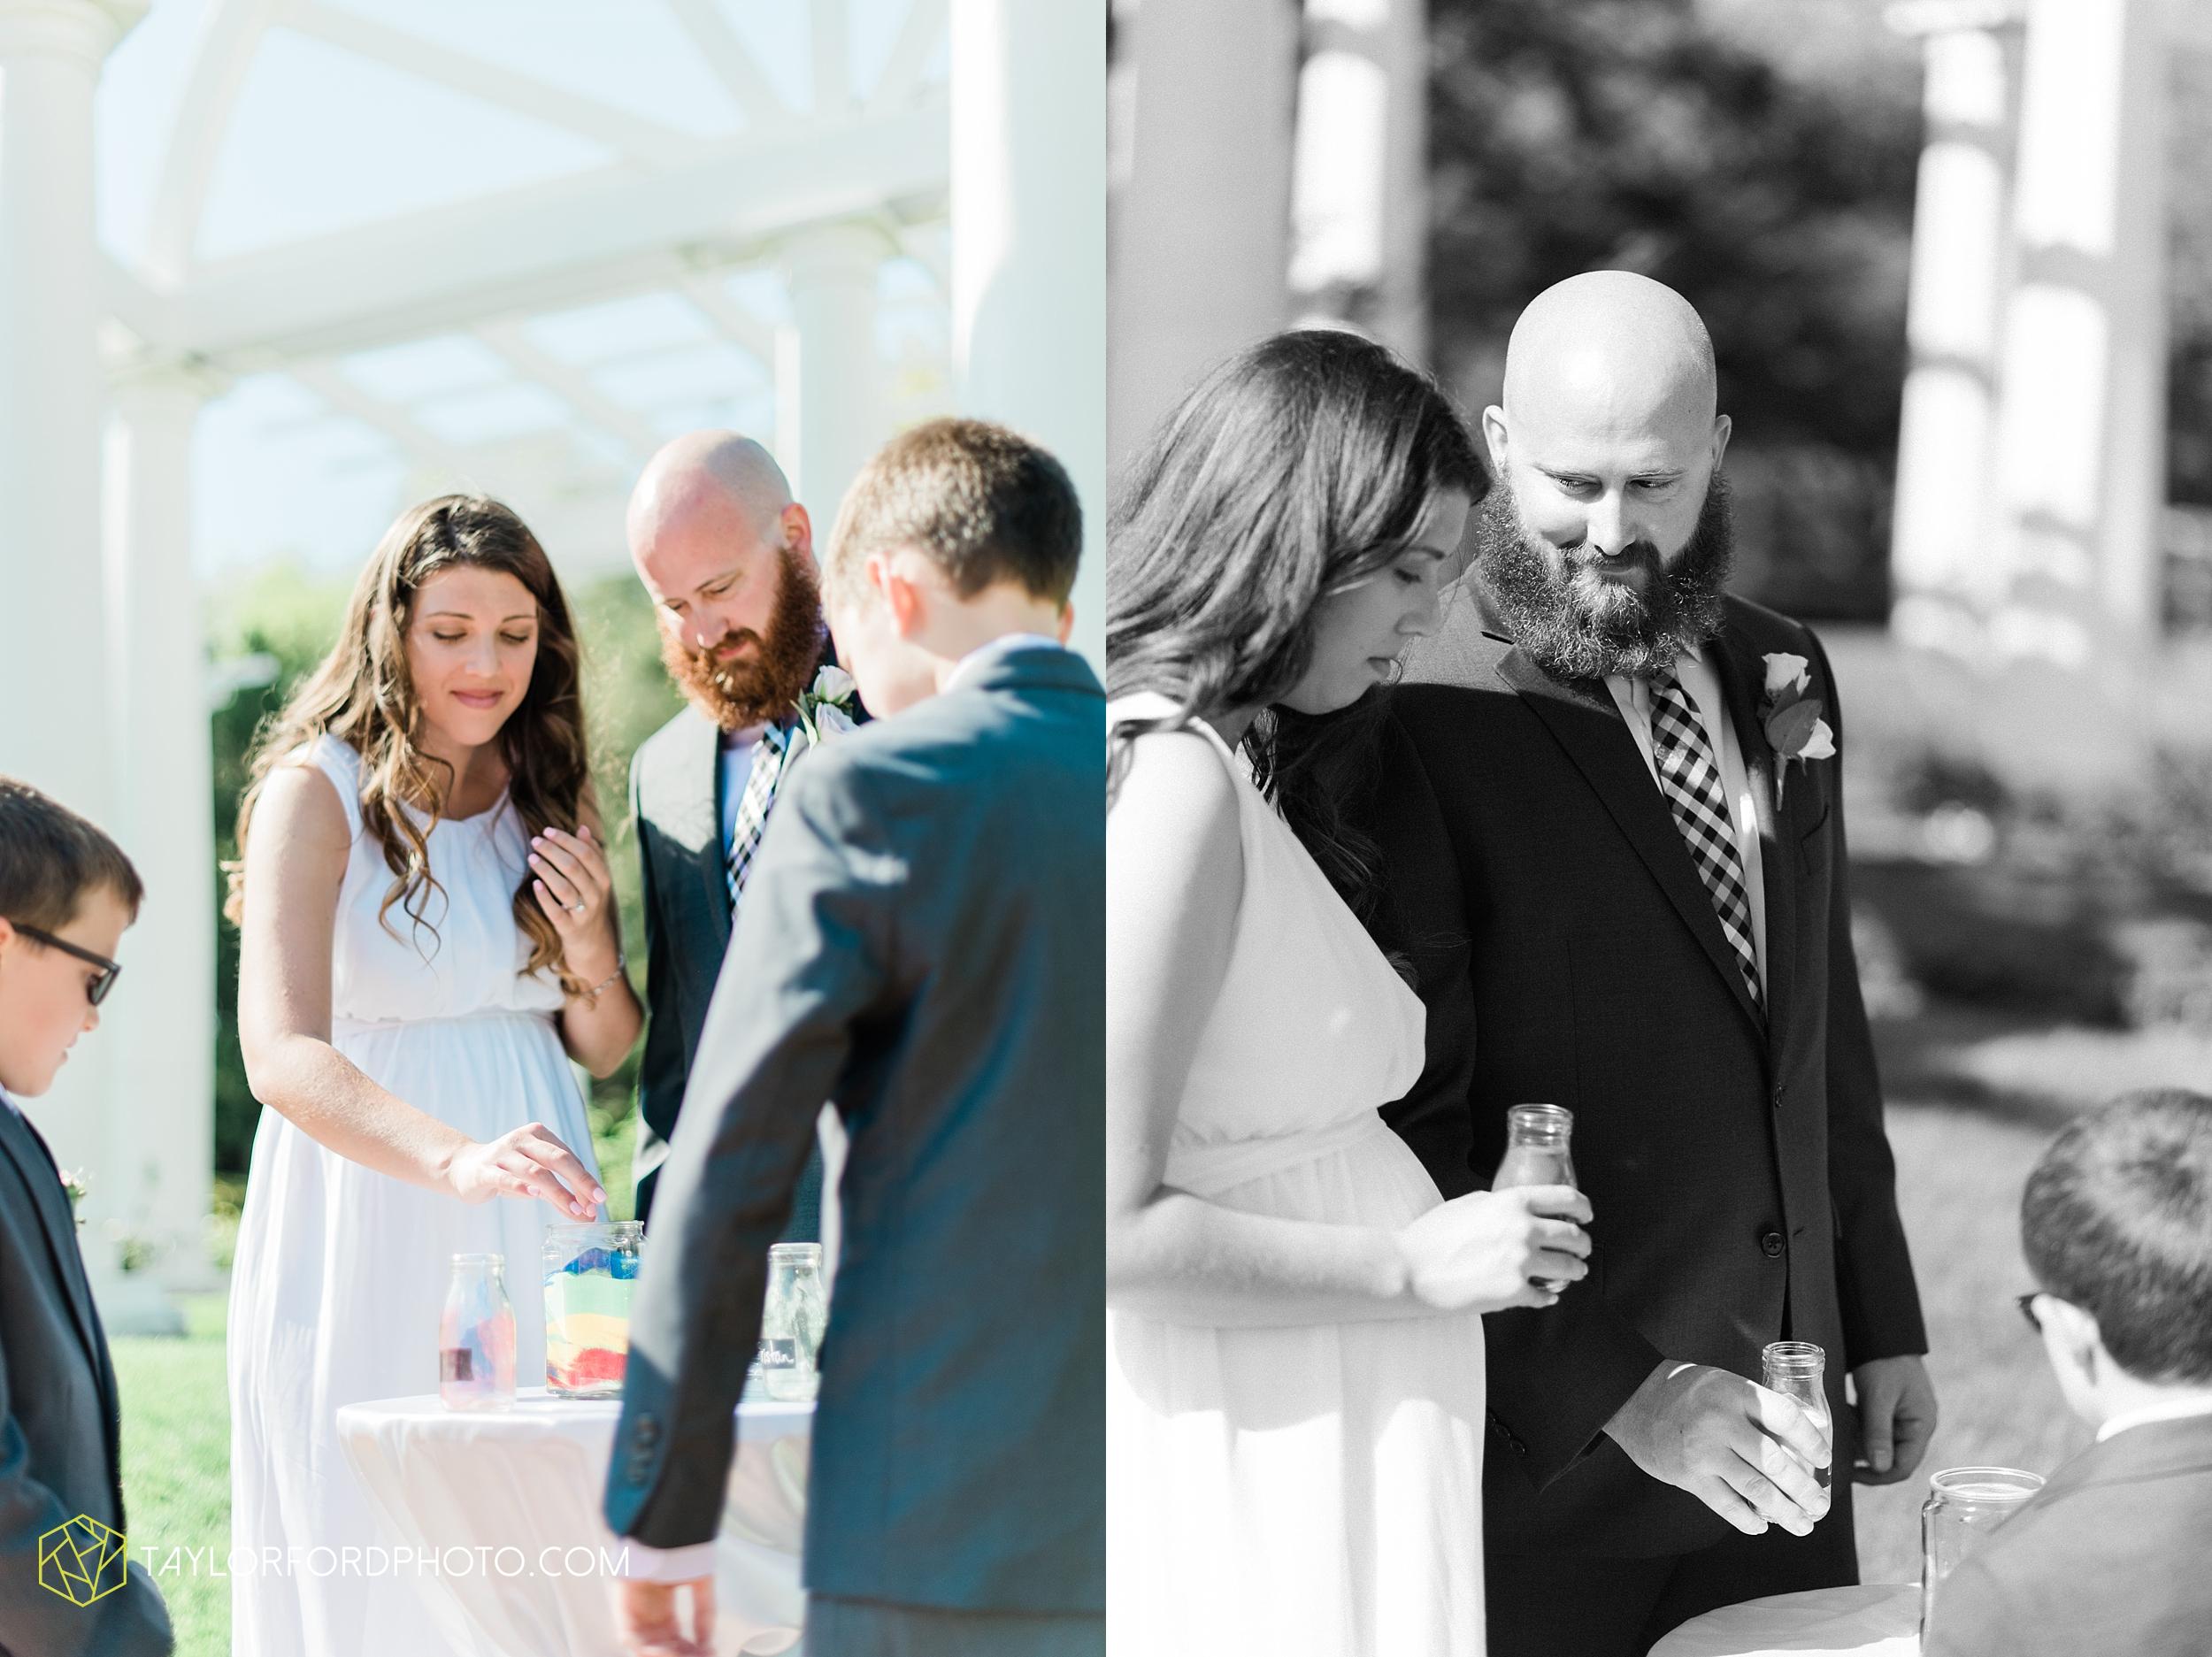 lakeside-rose-gardens-fort-wayne-indiana-elopement-wedding-photographer-Taylor-Ford-Photography_7147.jpg